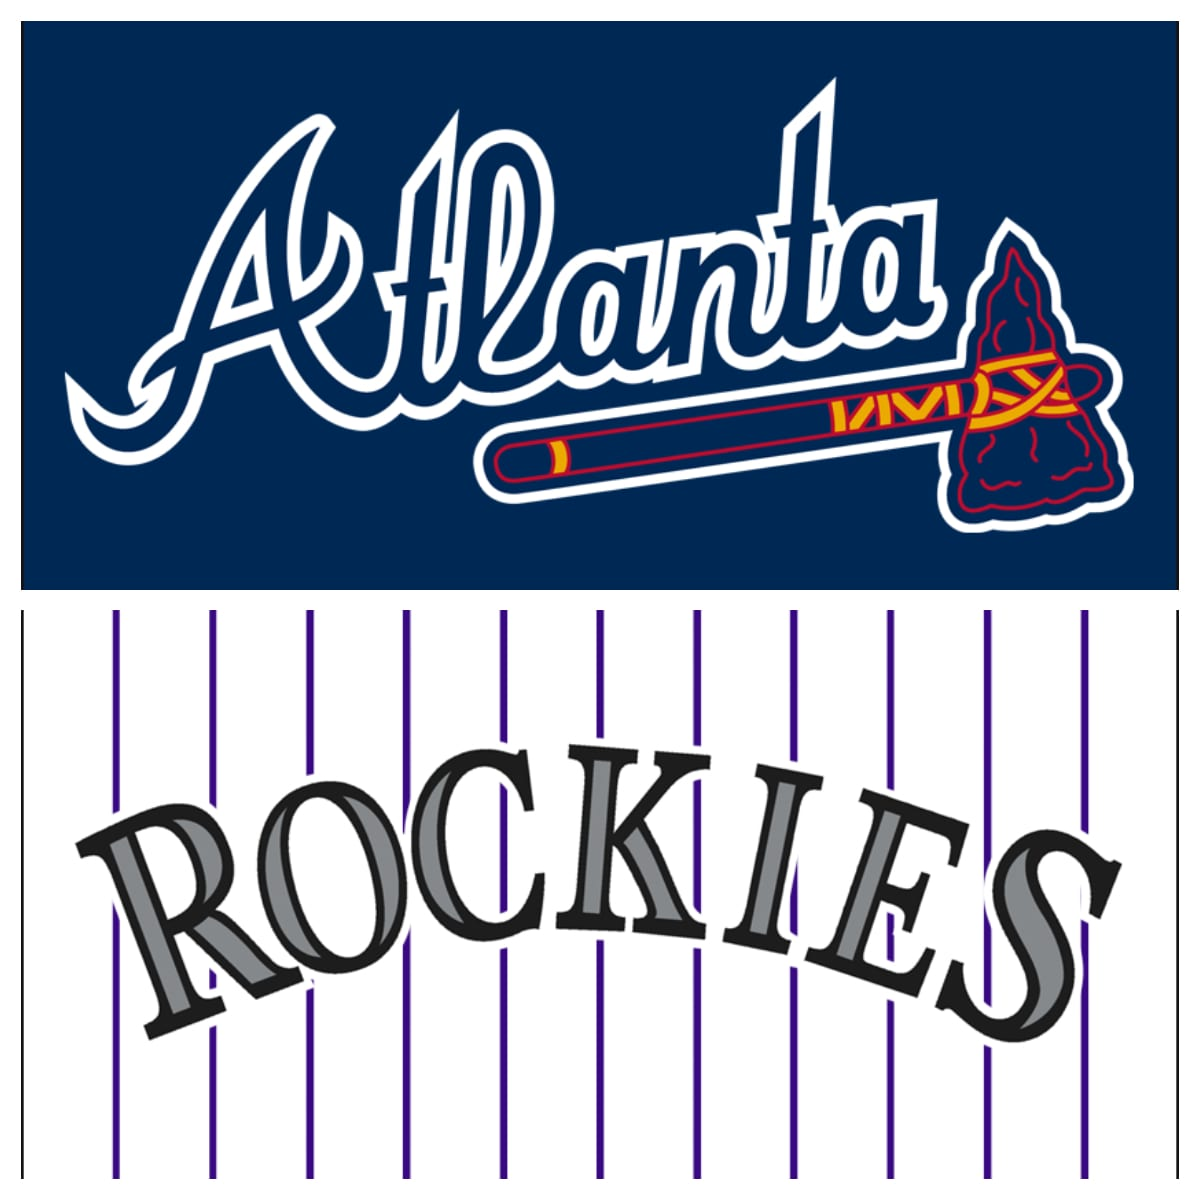 Atlanta Braves vs Colorado Rockies Stats